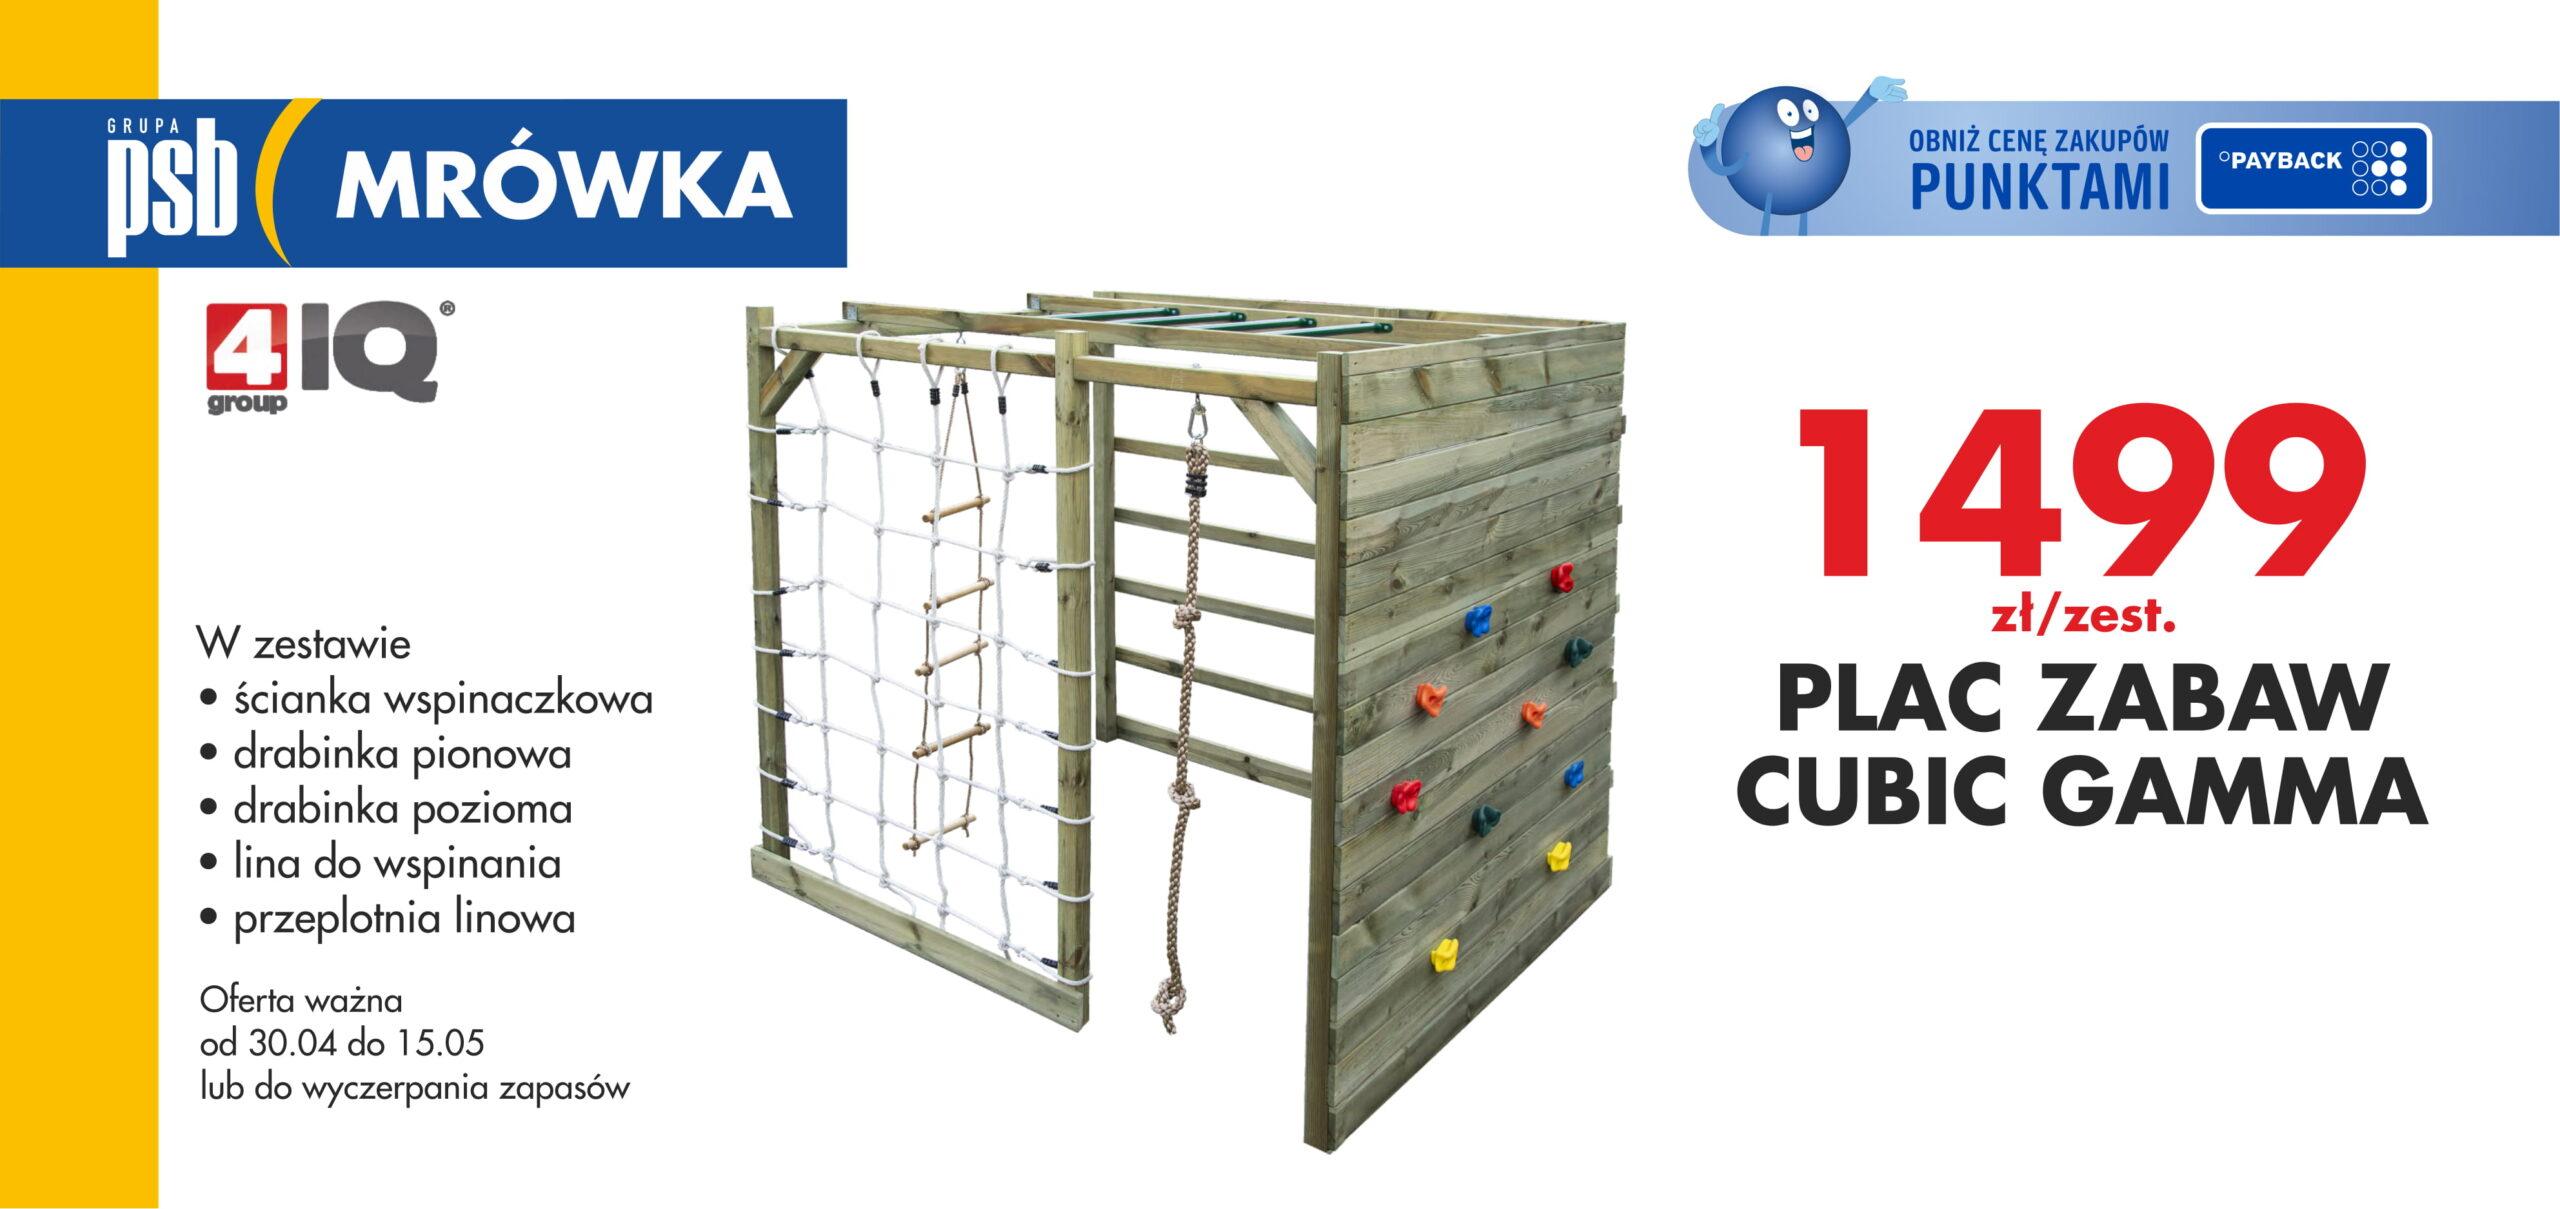 plac zabaw cubic